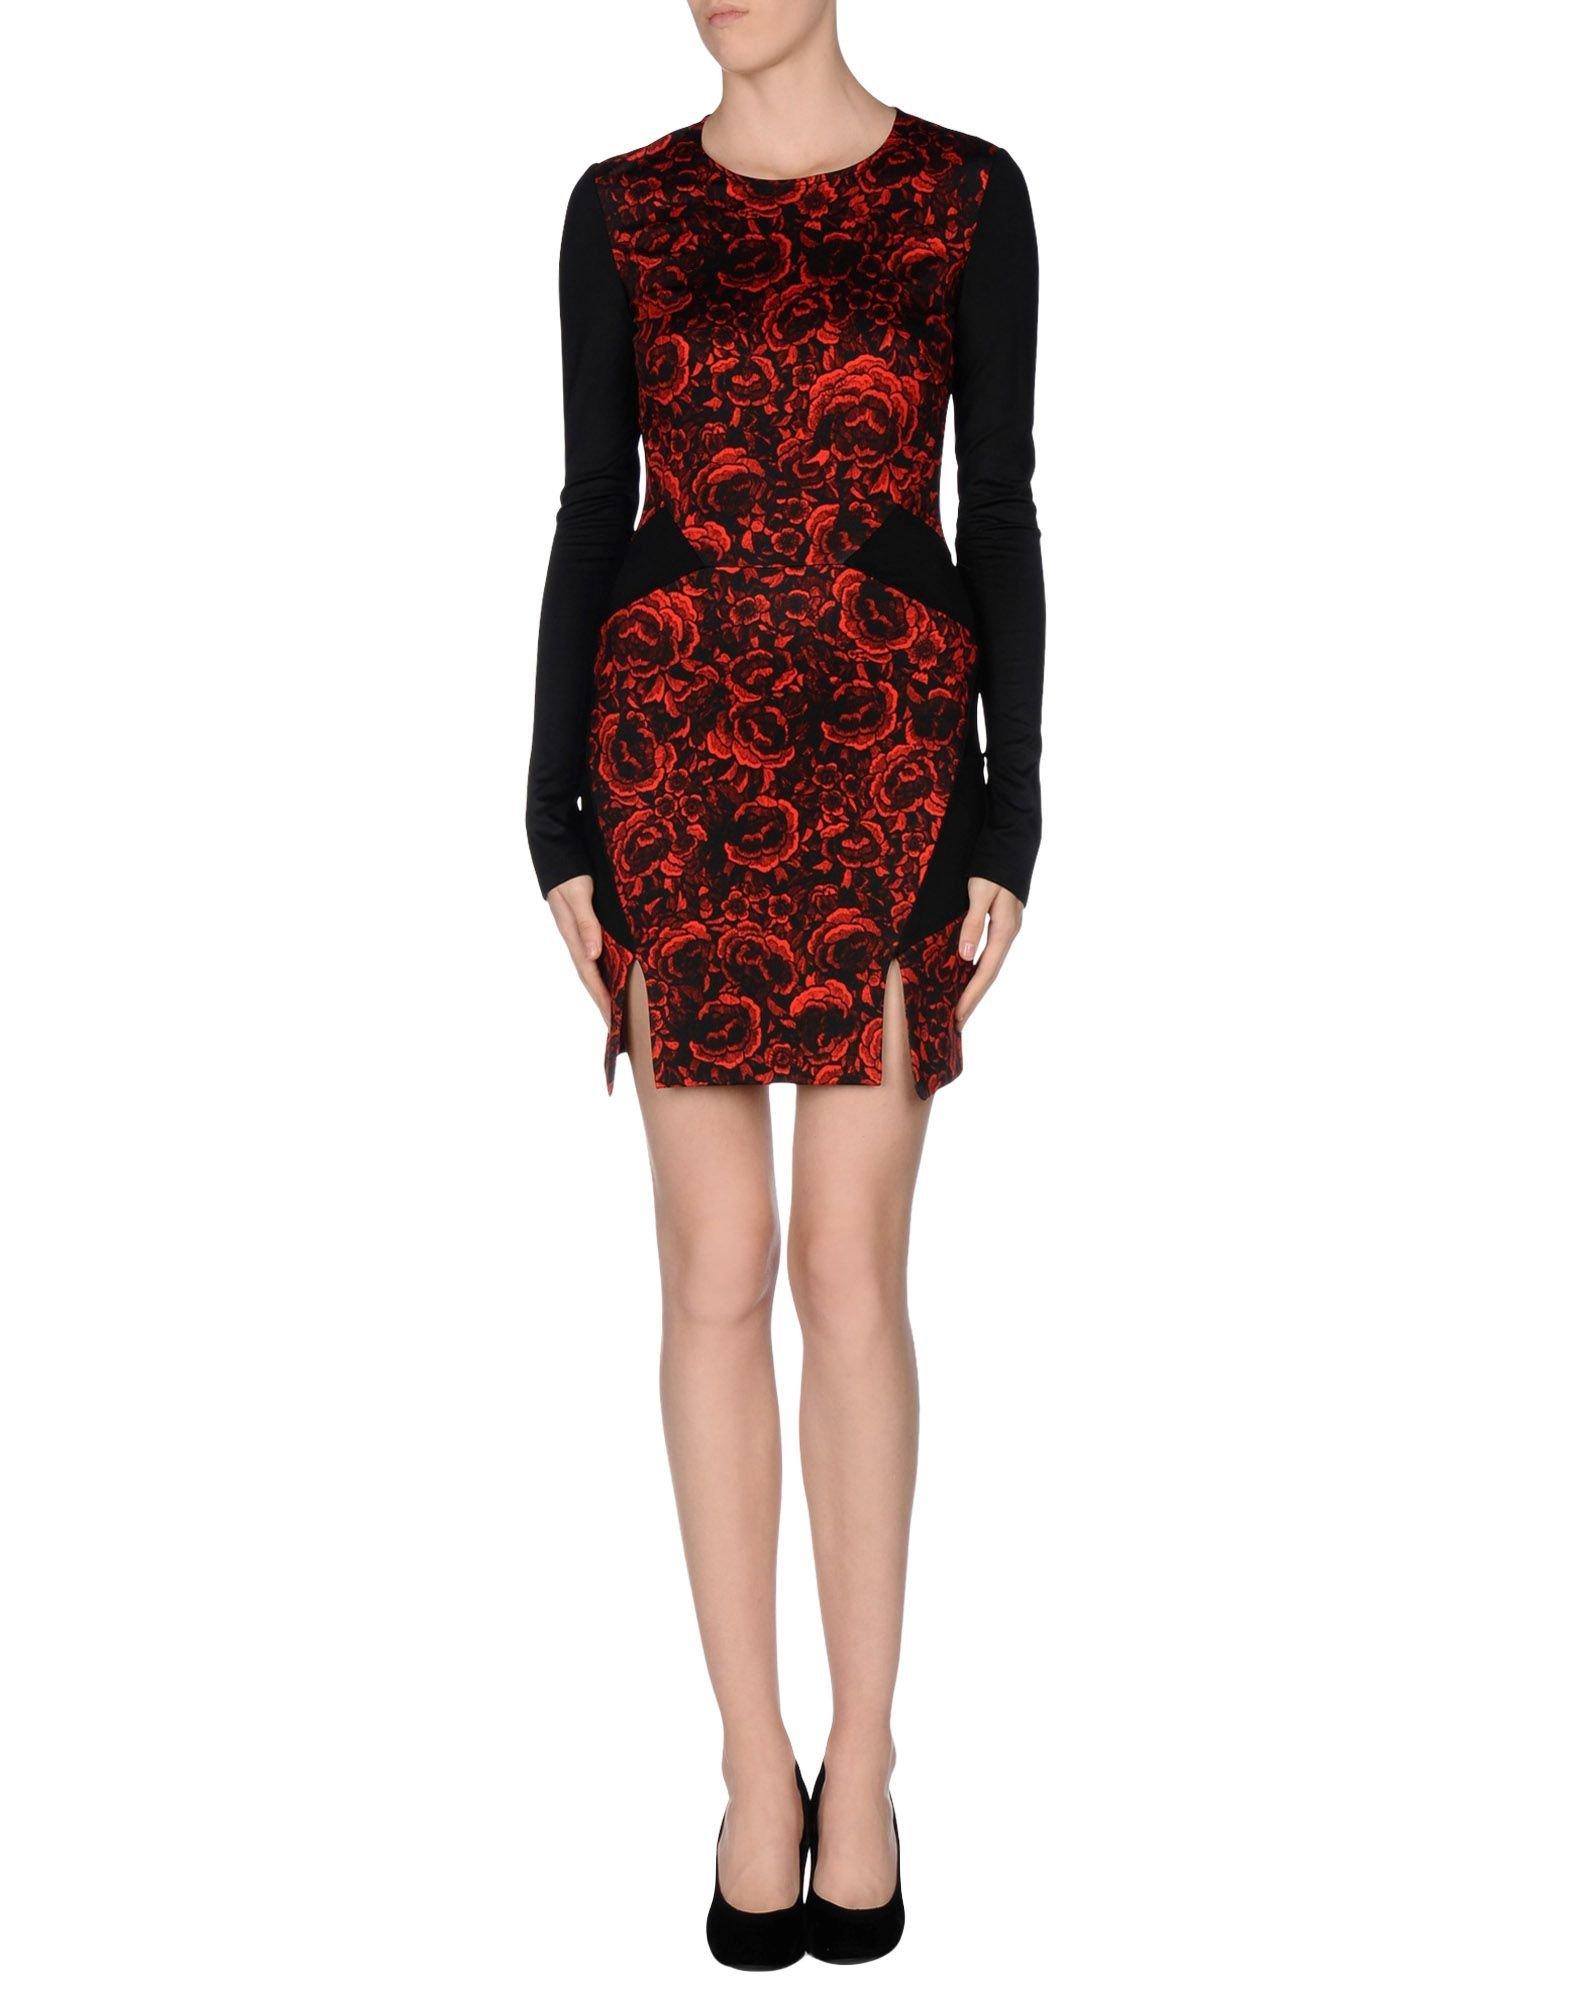 Lyst Just Cavalli Short Dress In Red